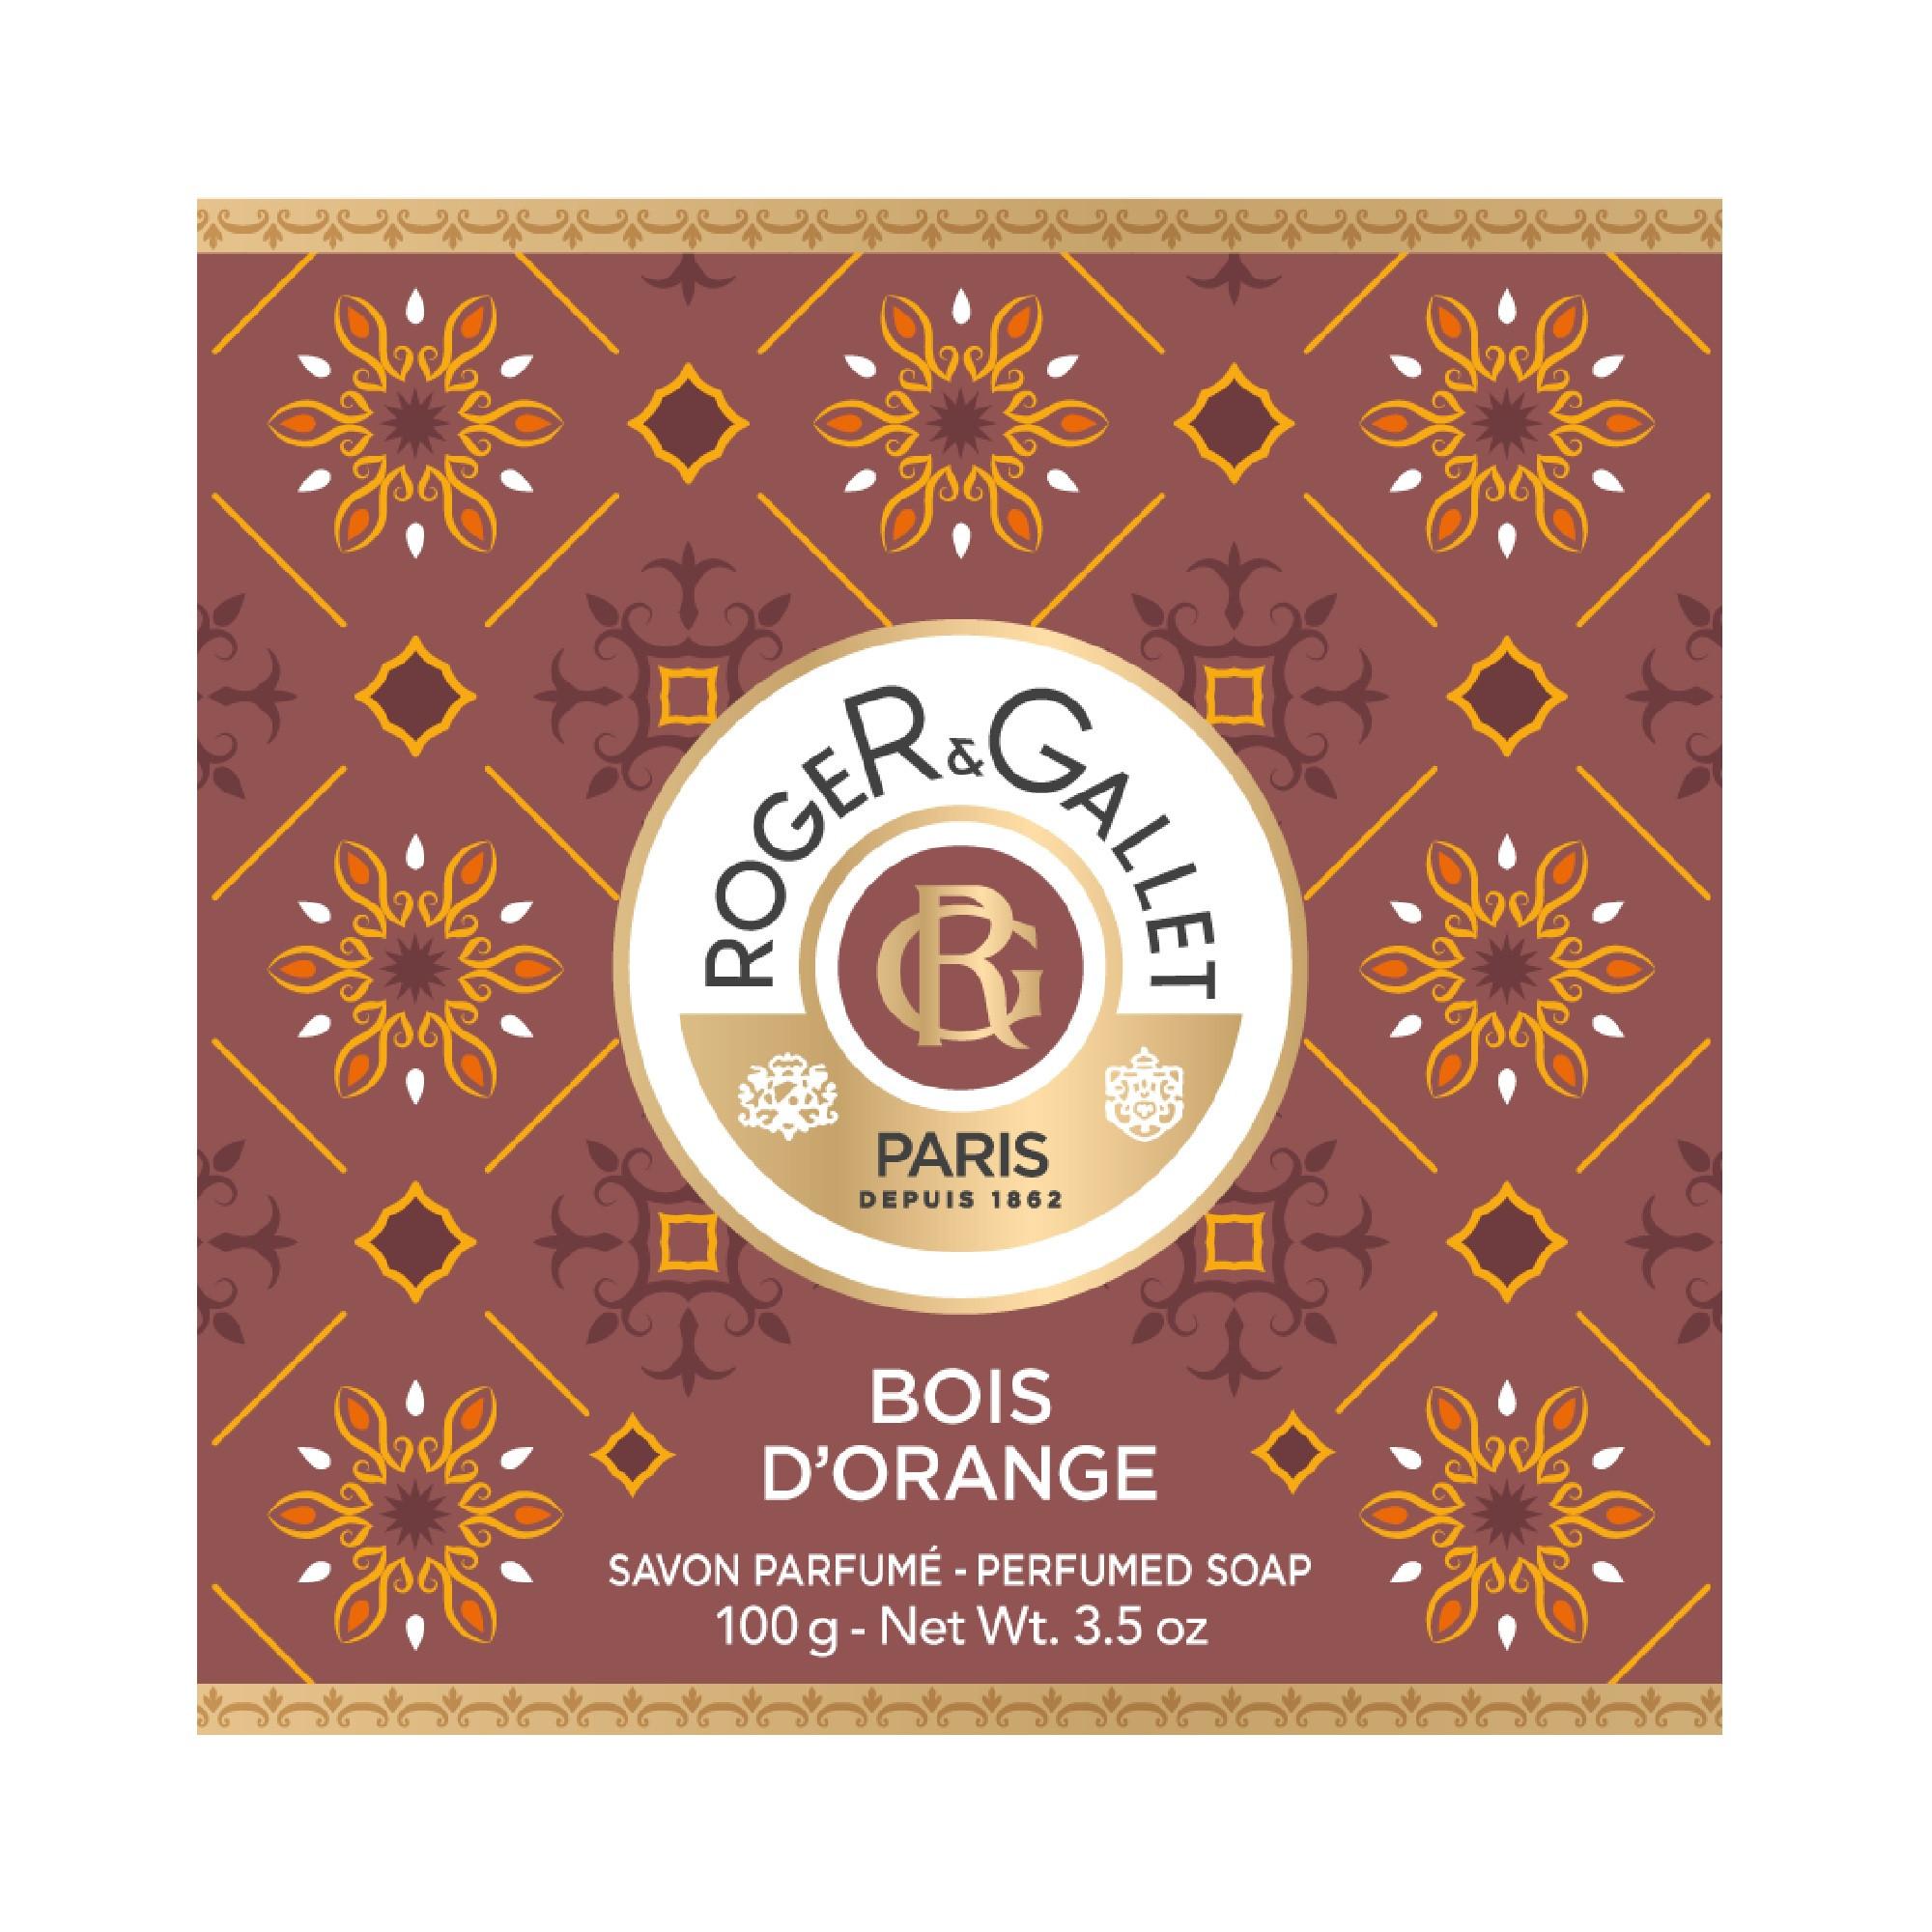 Bois d'Orange